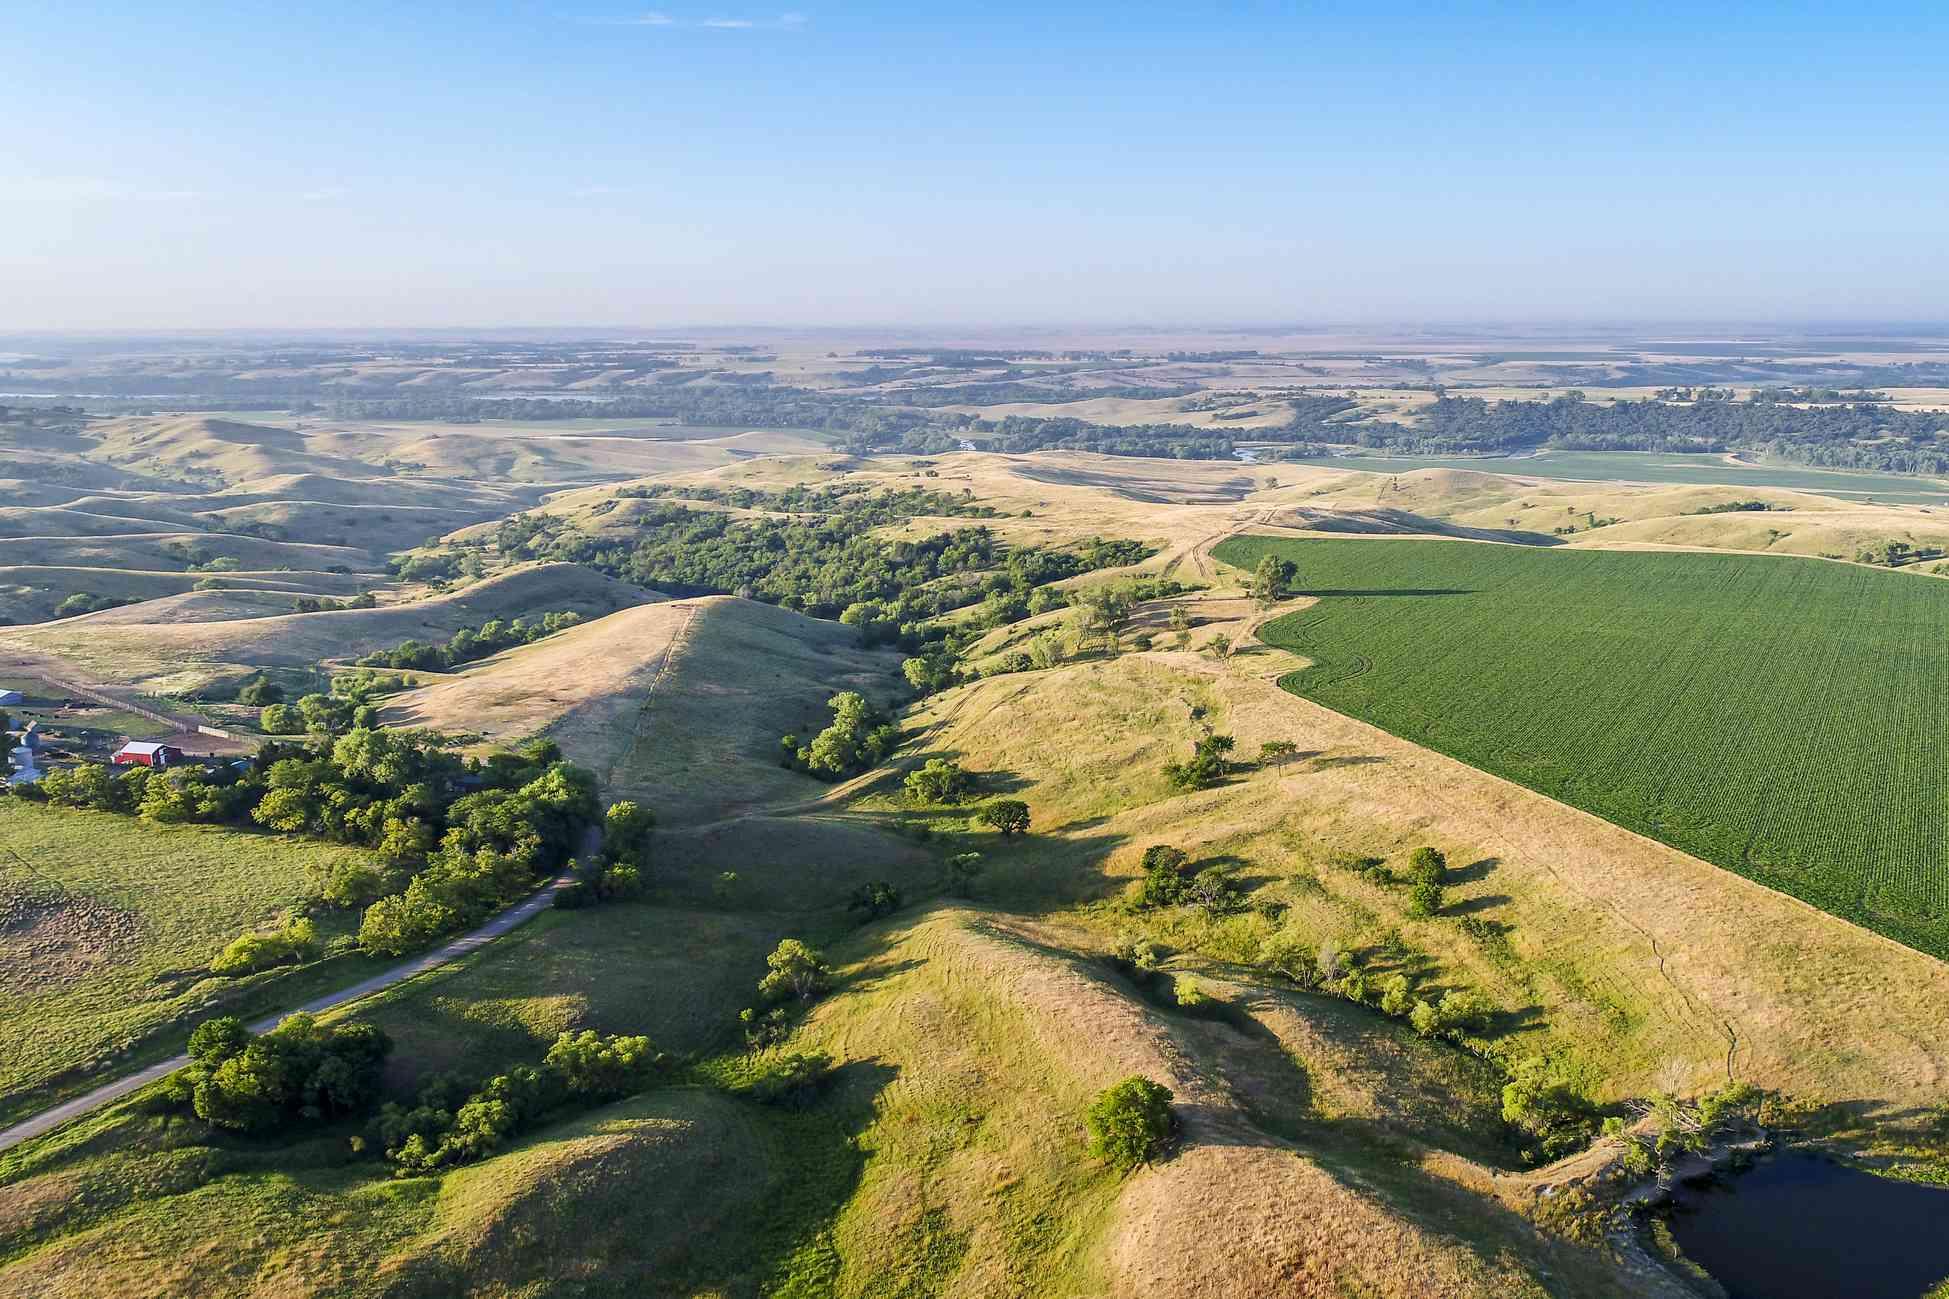 Aerial view of the Nebraska Sandhills and road